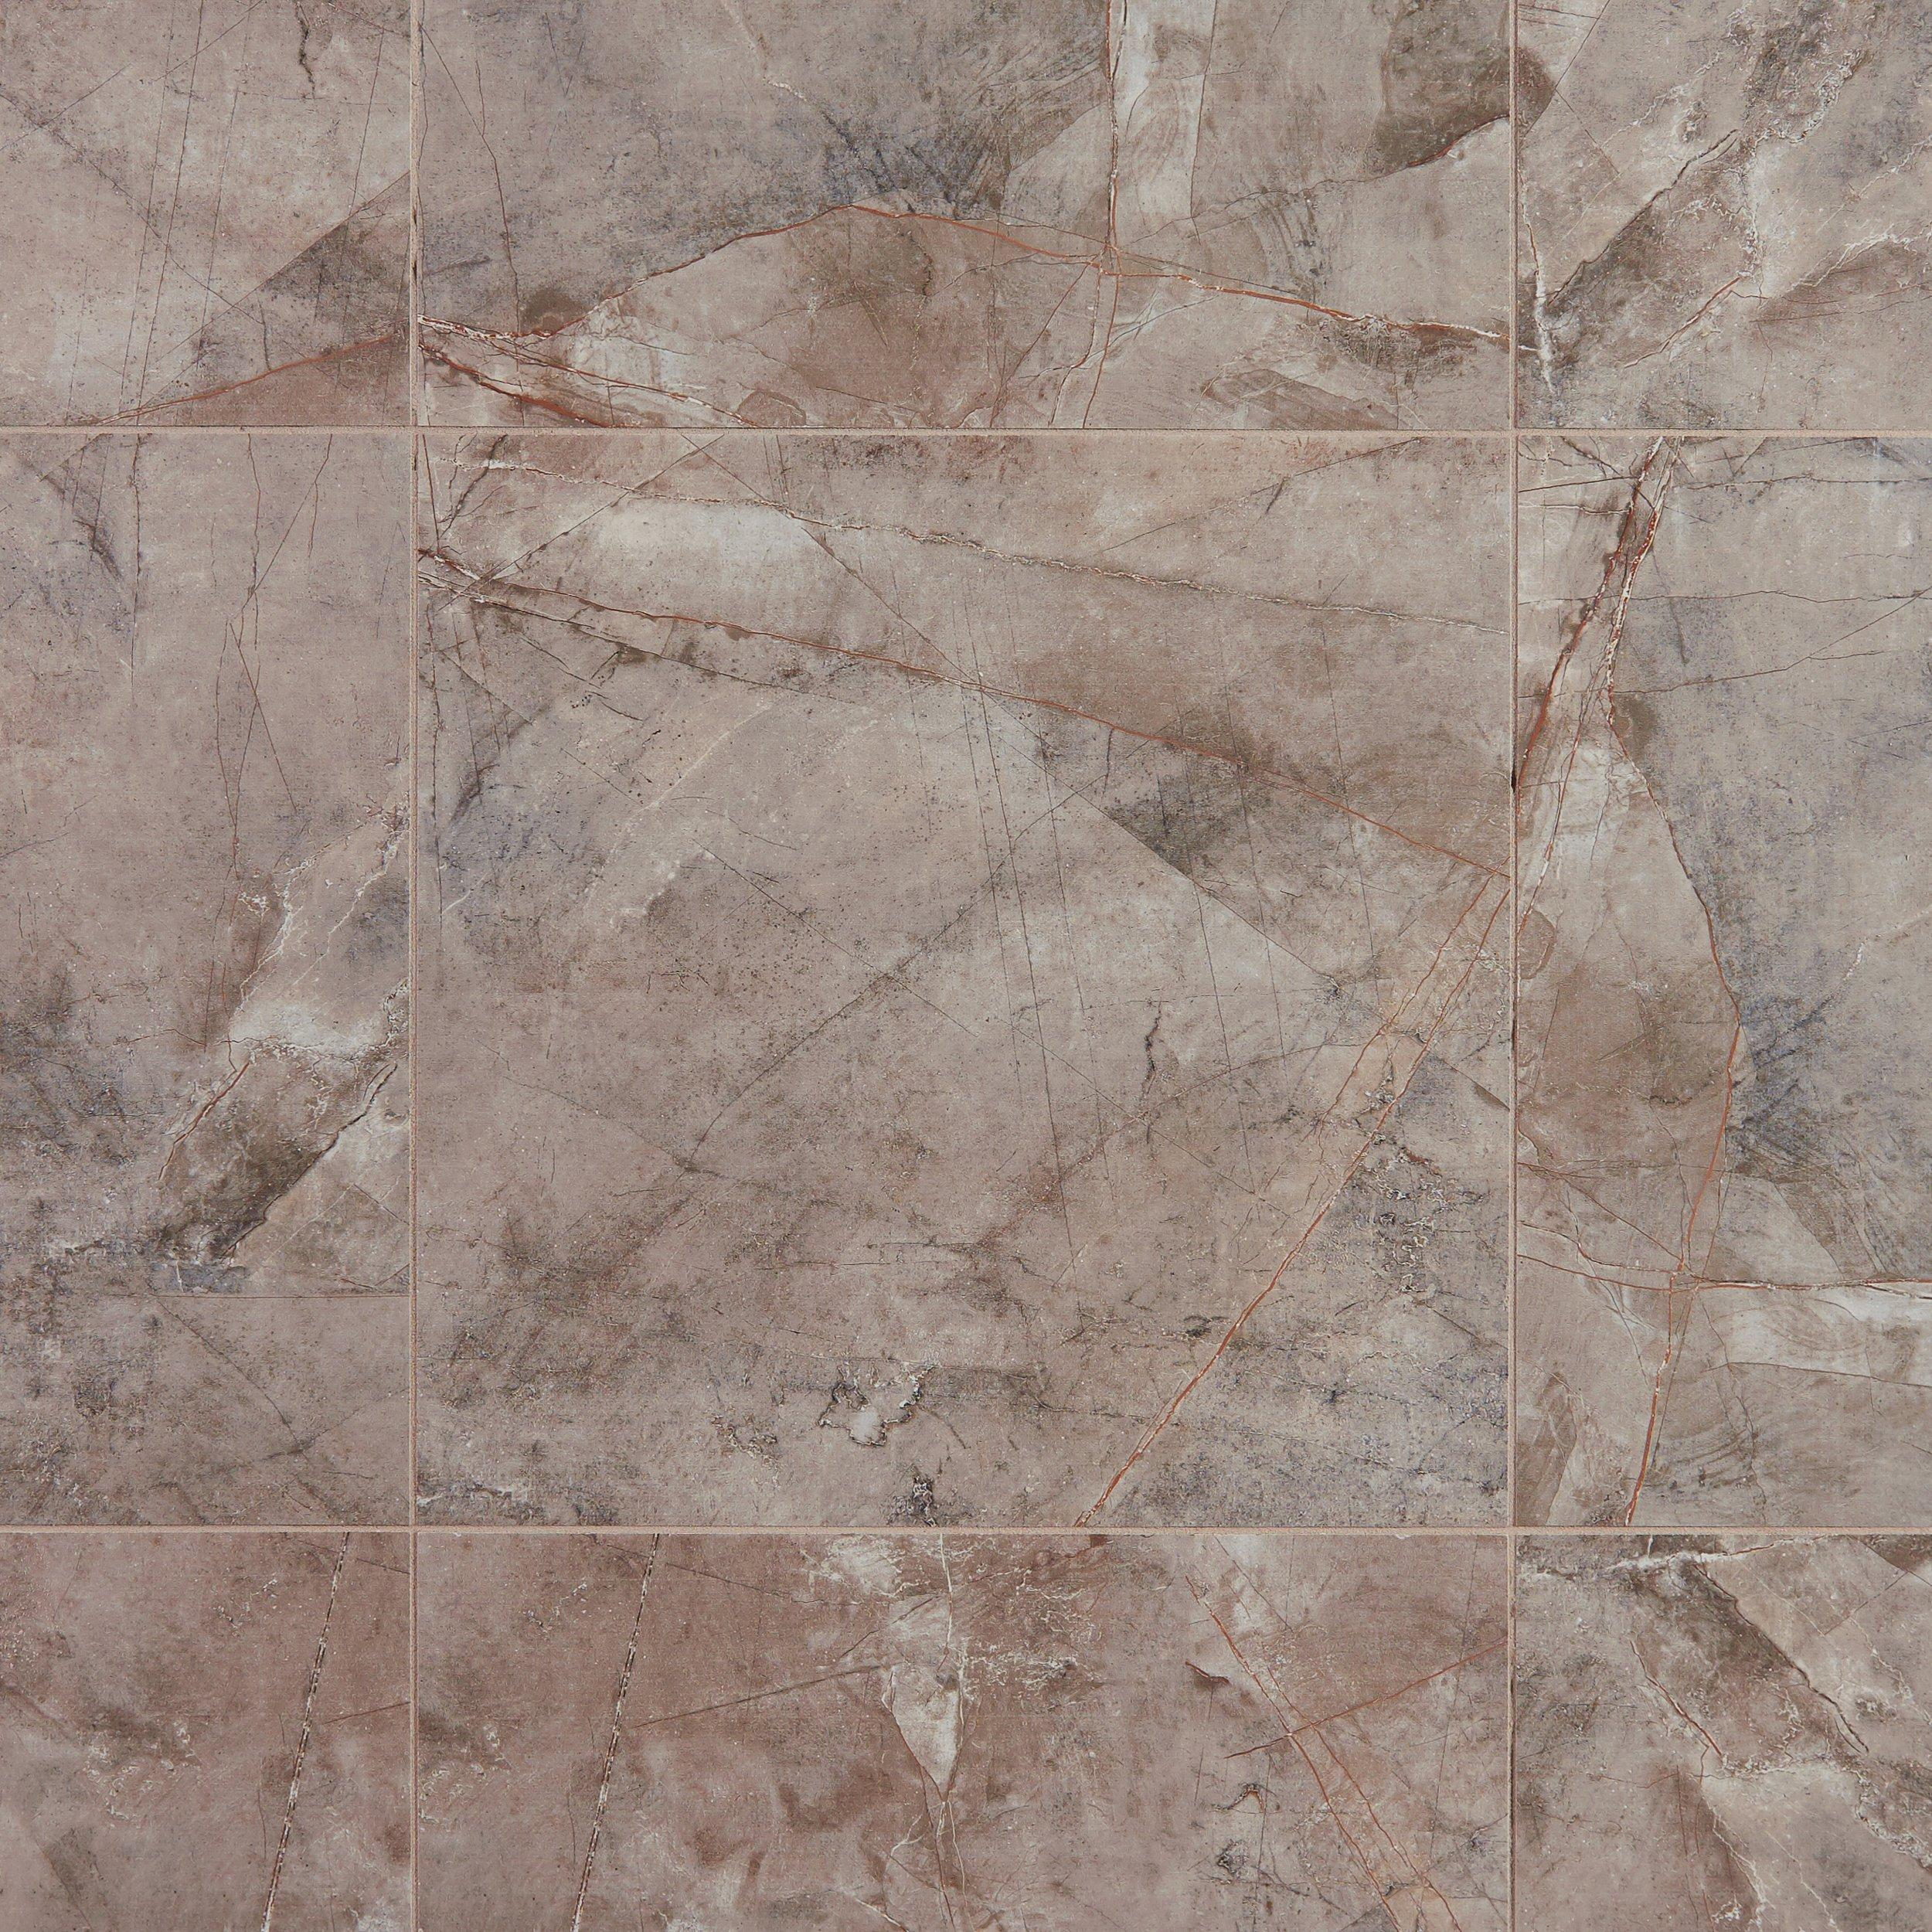 Ceramic tile ceramic tile tile flooring floor decor dailygadgetfo Image collections